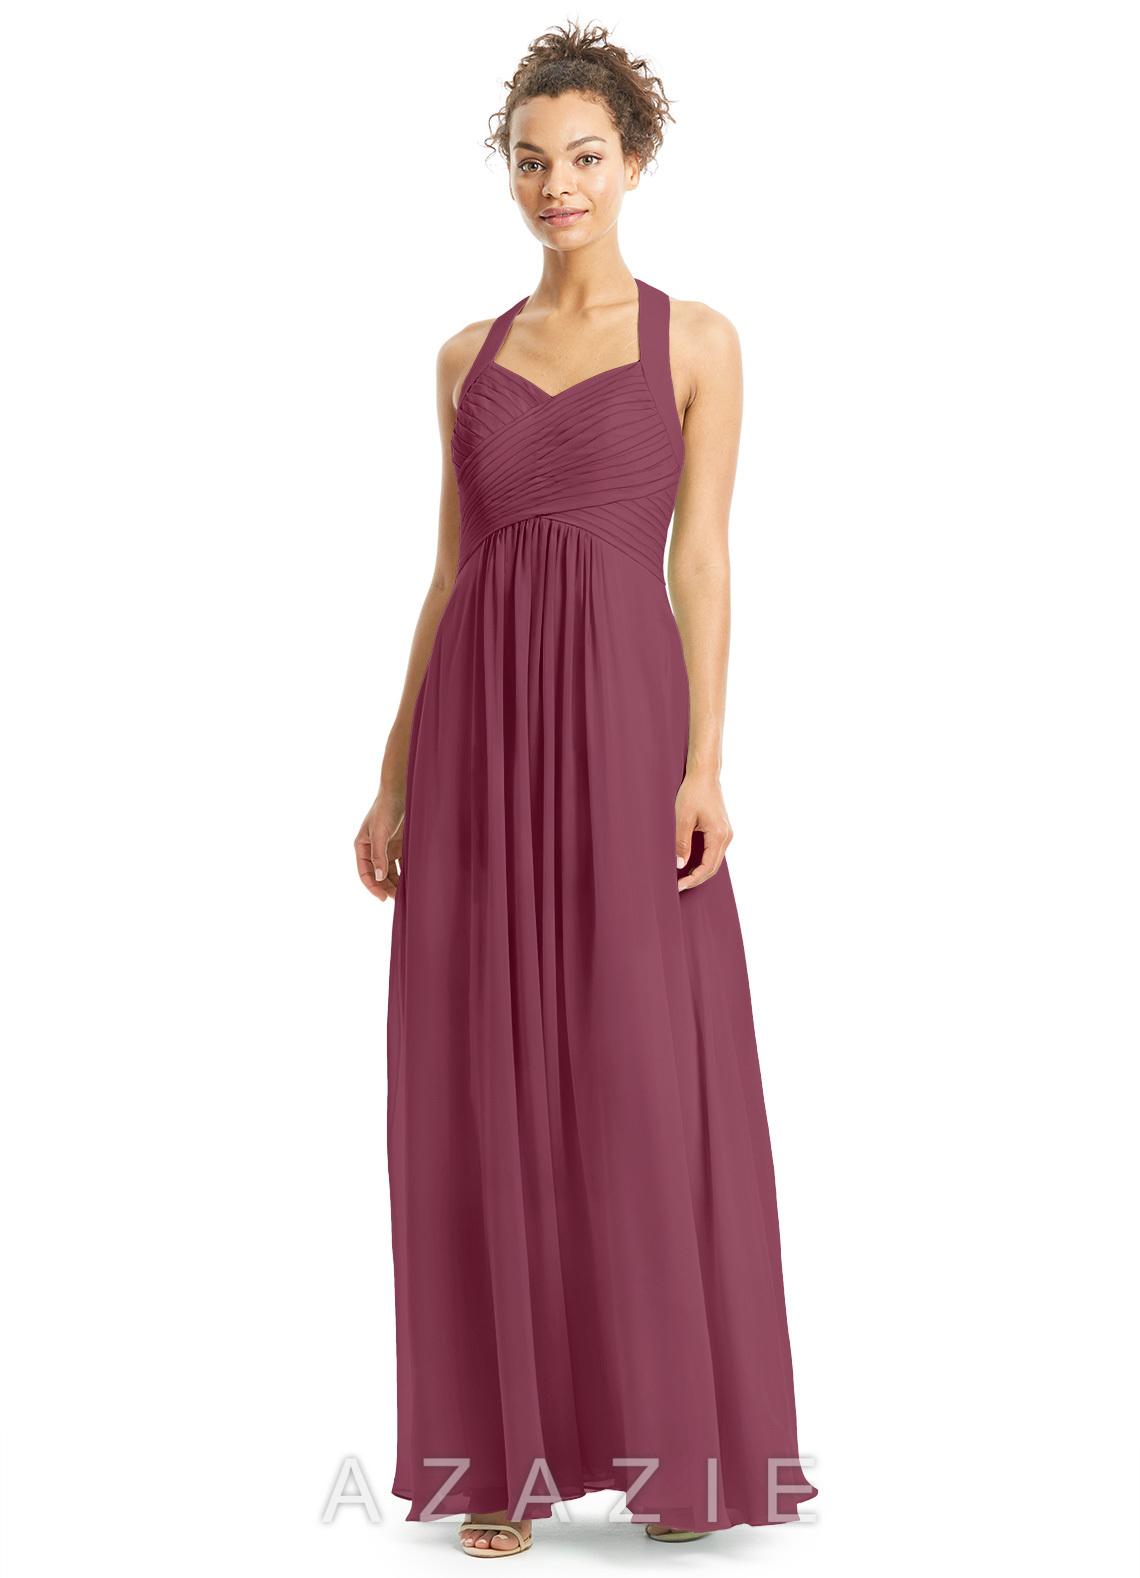 Azazie savannah bridesmaid dress azazie loading zoom ombrellifo Image collections